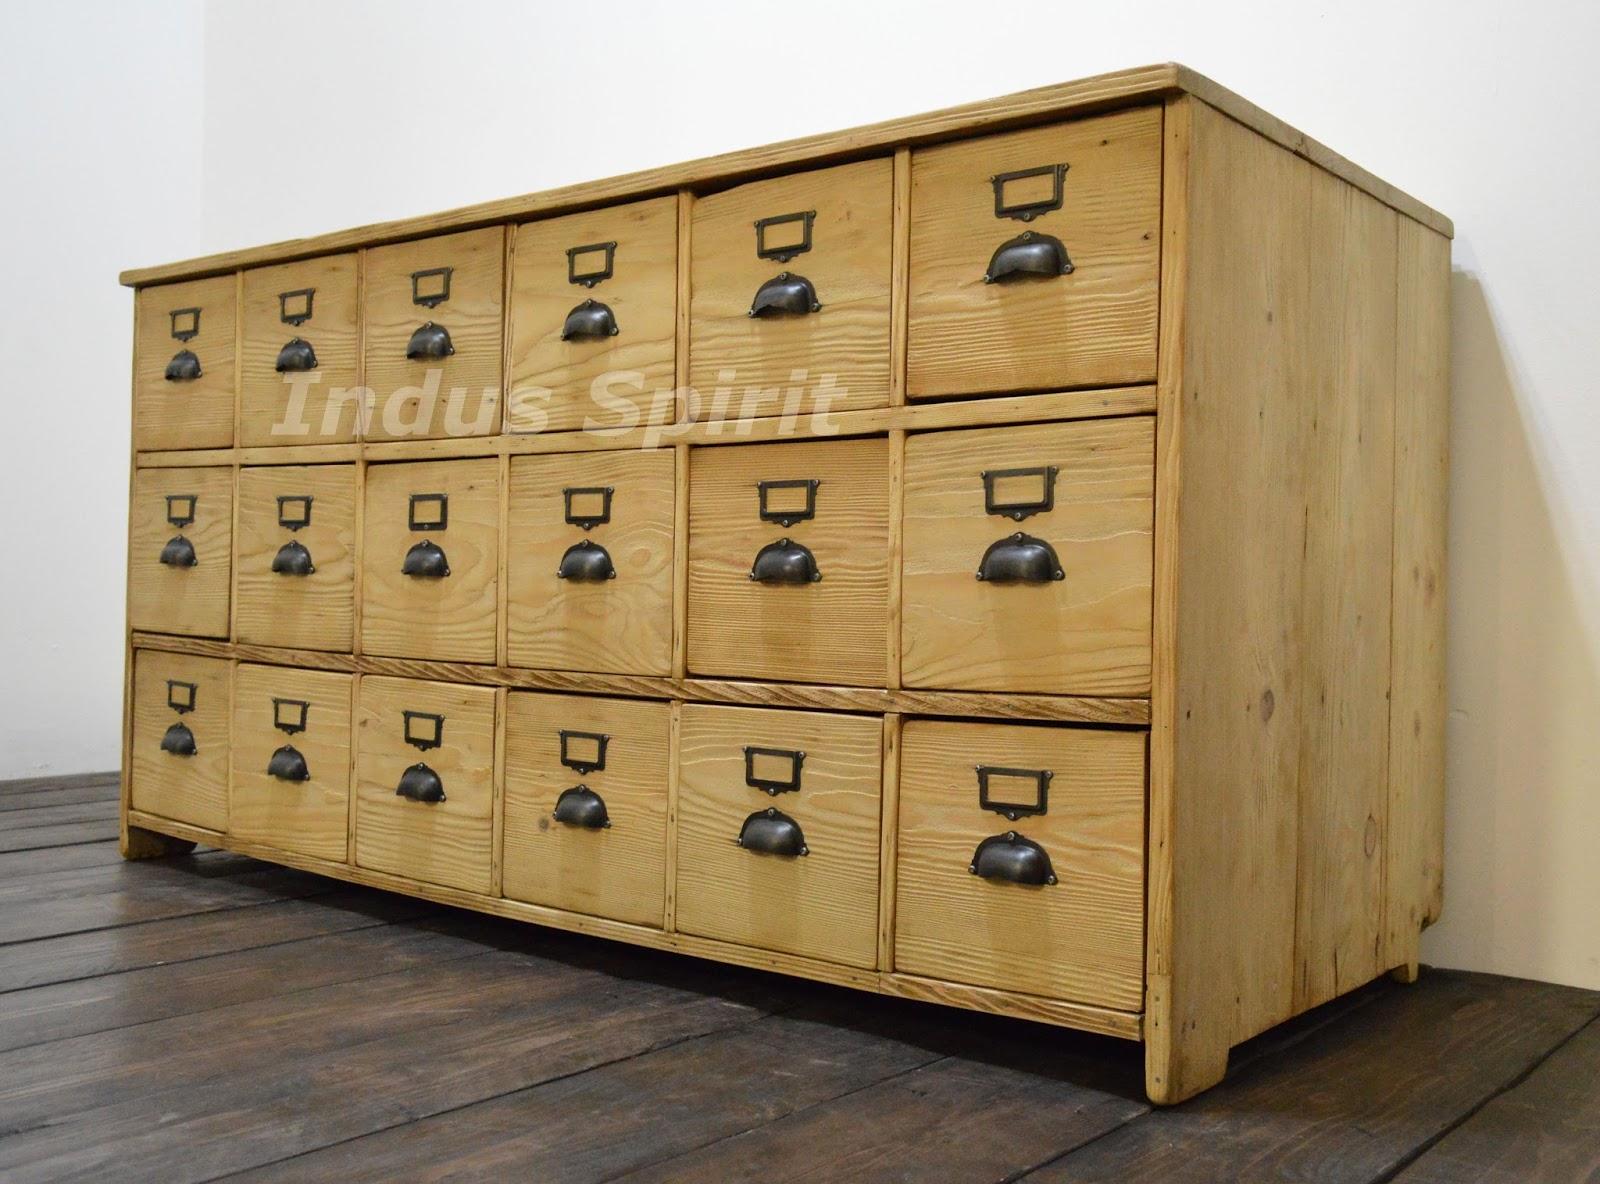 Ancien meuble de m tier - Charniere de meuble ancien ...